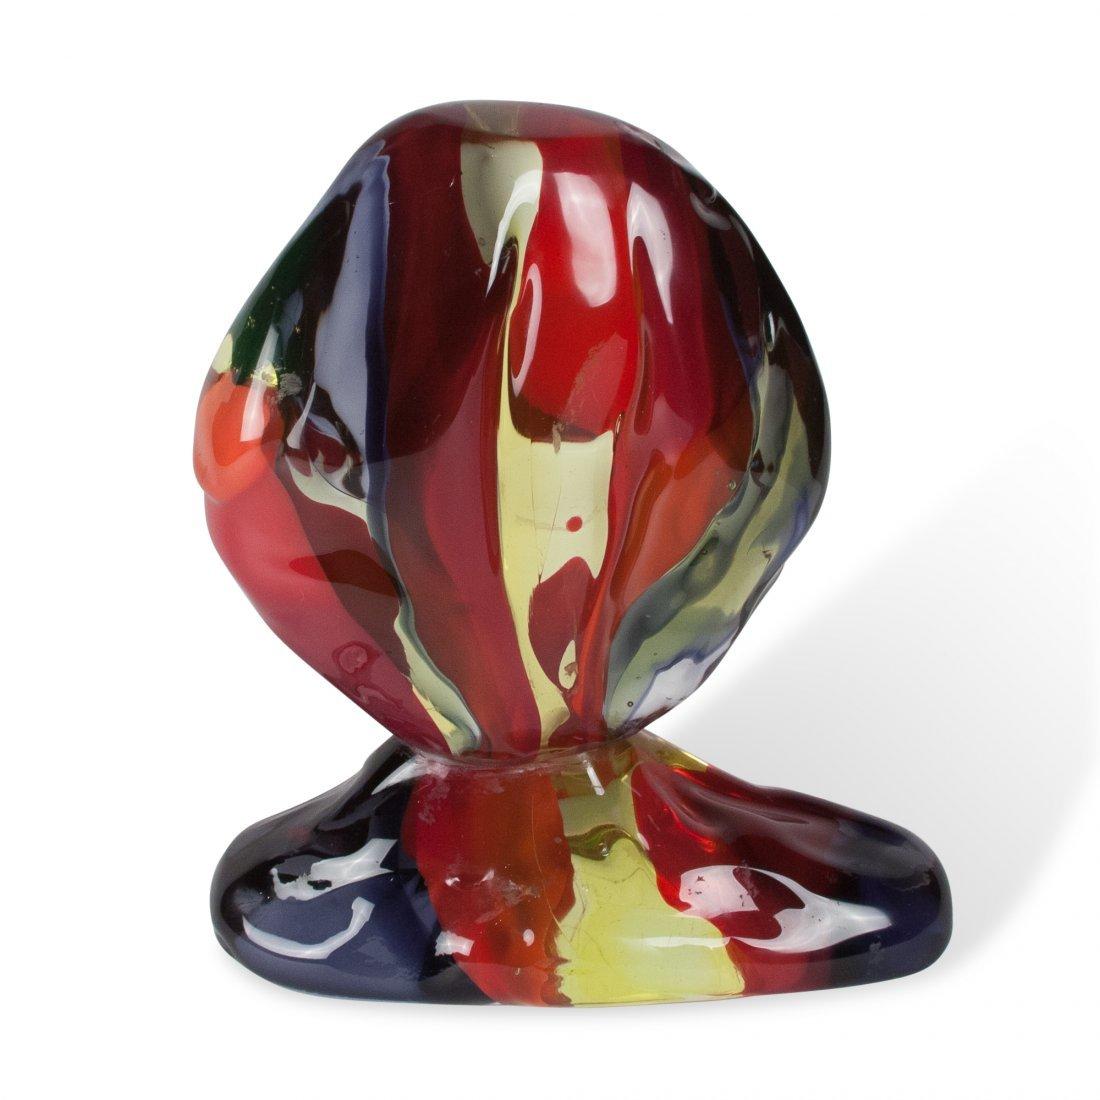 Luciano Gaspari Glass Sculpture (Repaired) - 3